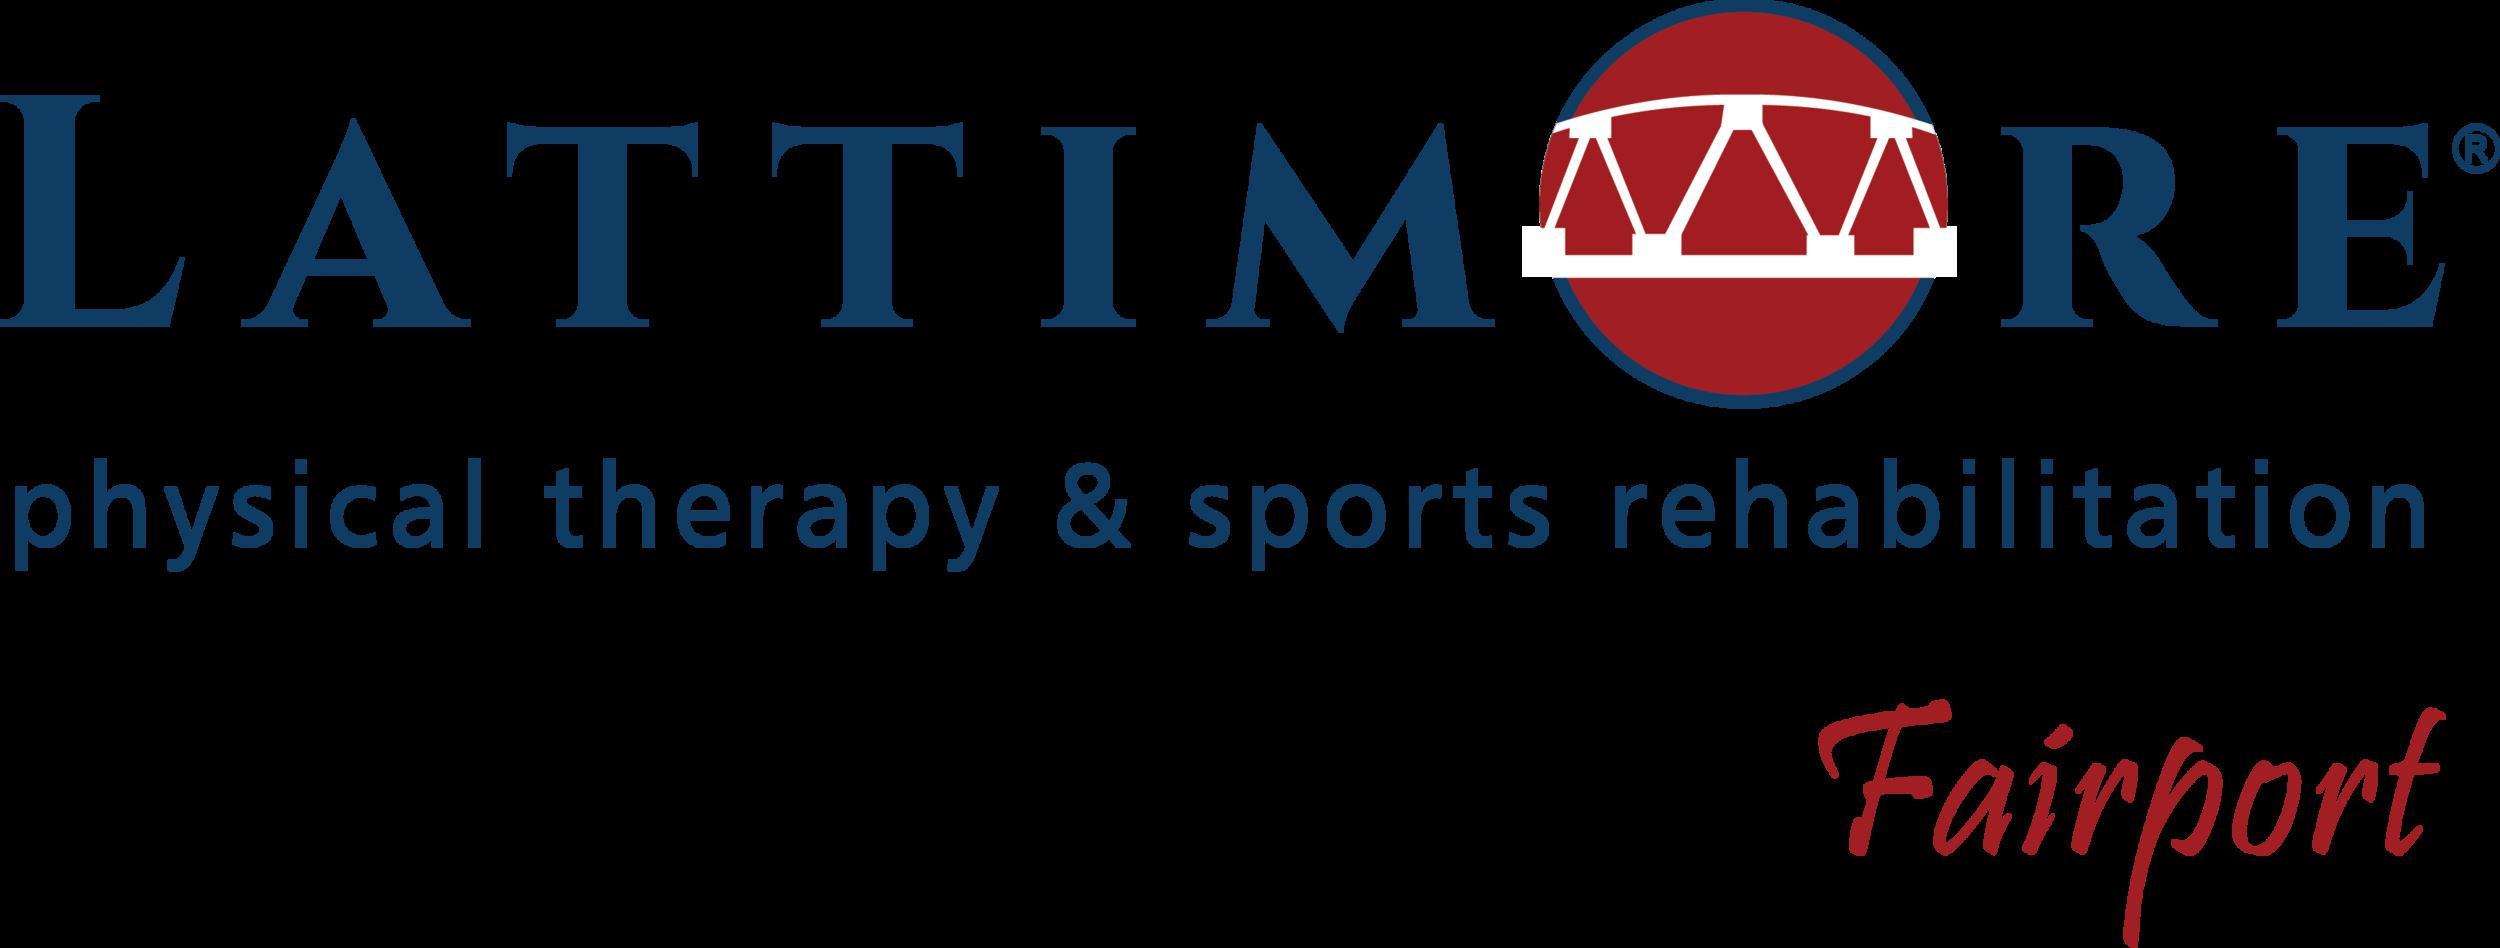 2019-05_Lattimore-Logo-Fairport.png